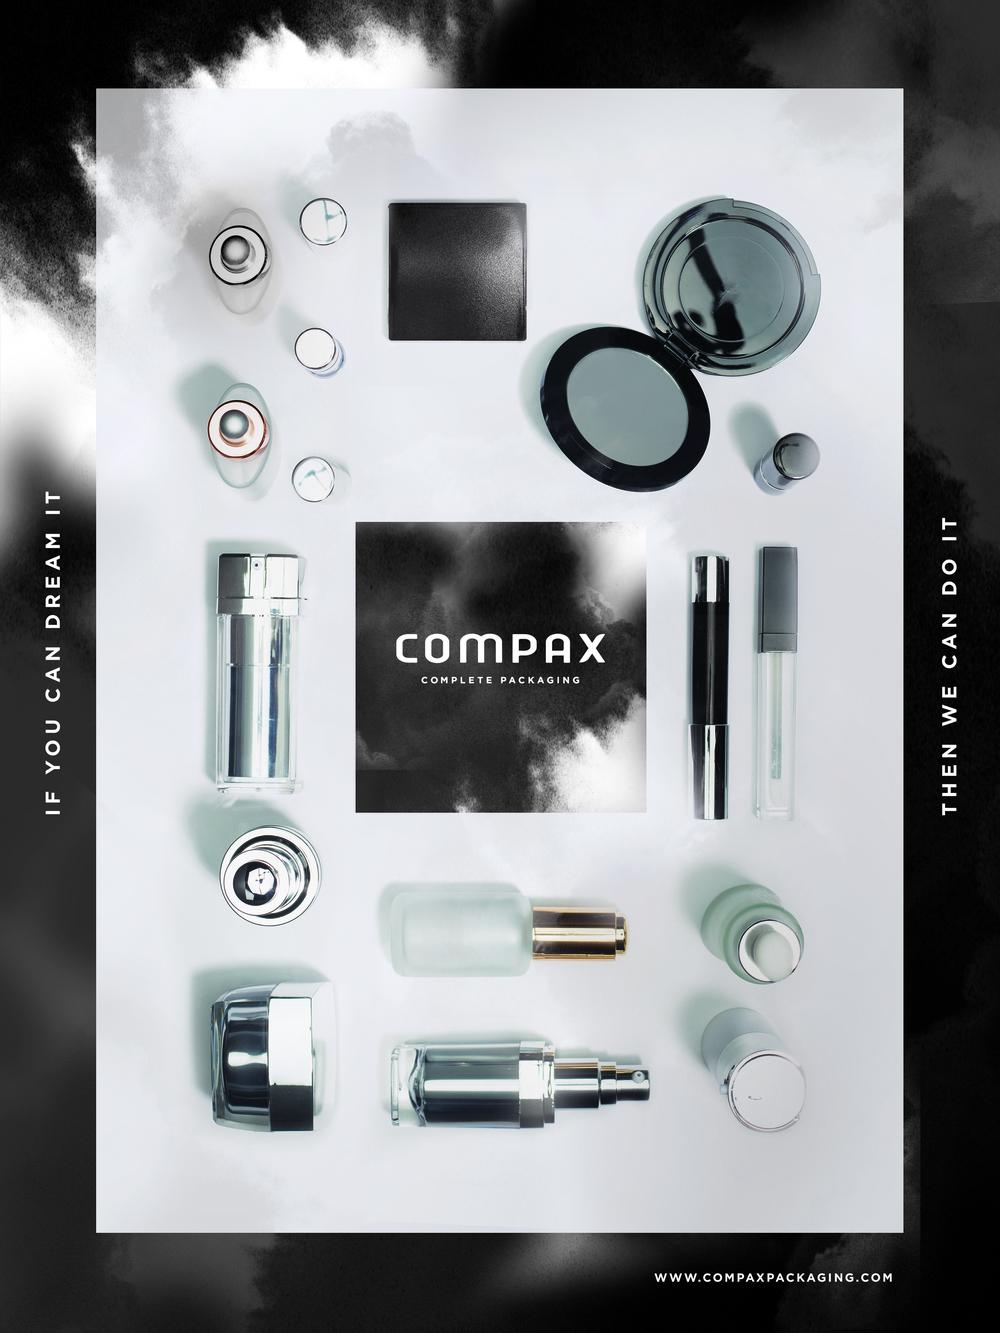 compax_concept_brandad_01c.jpg